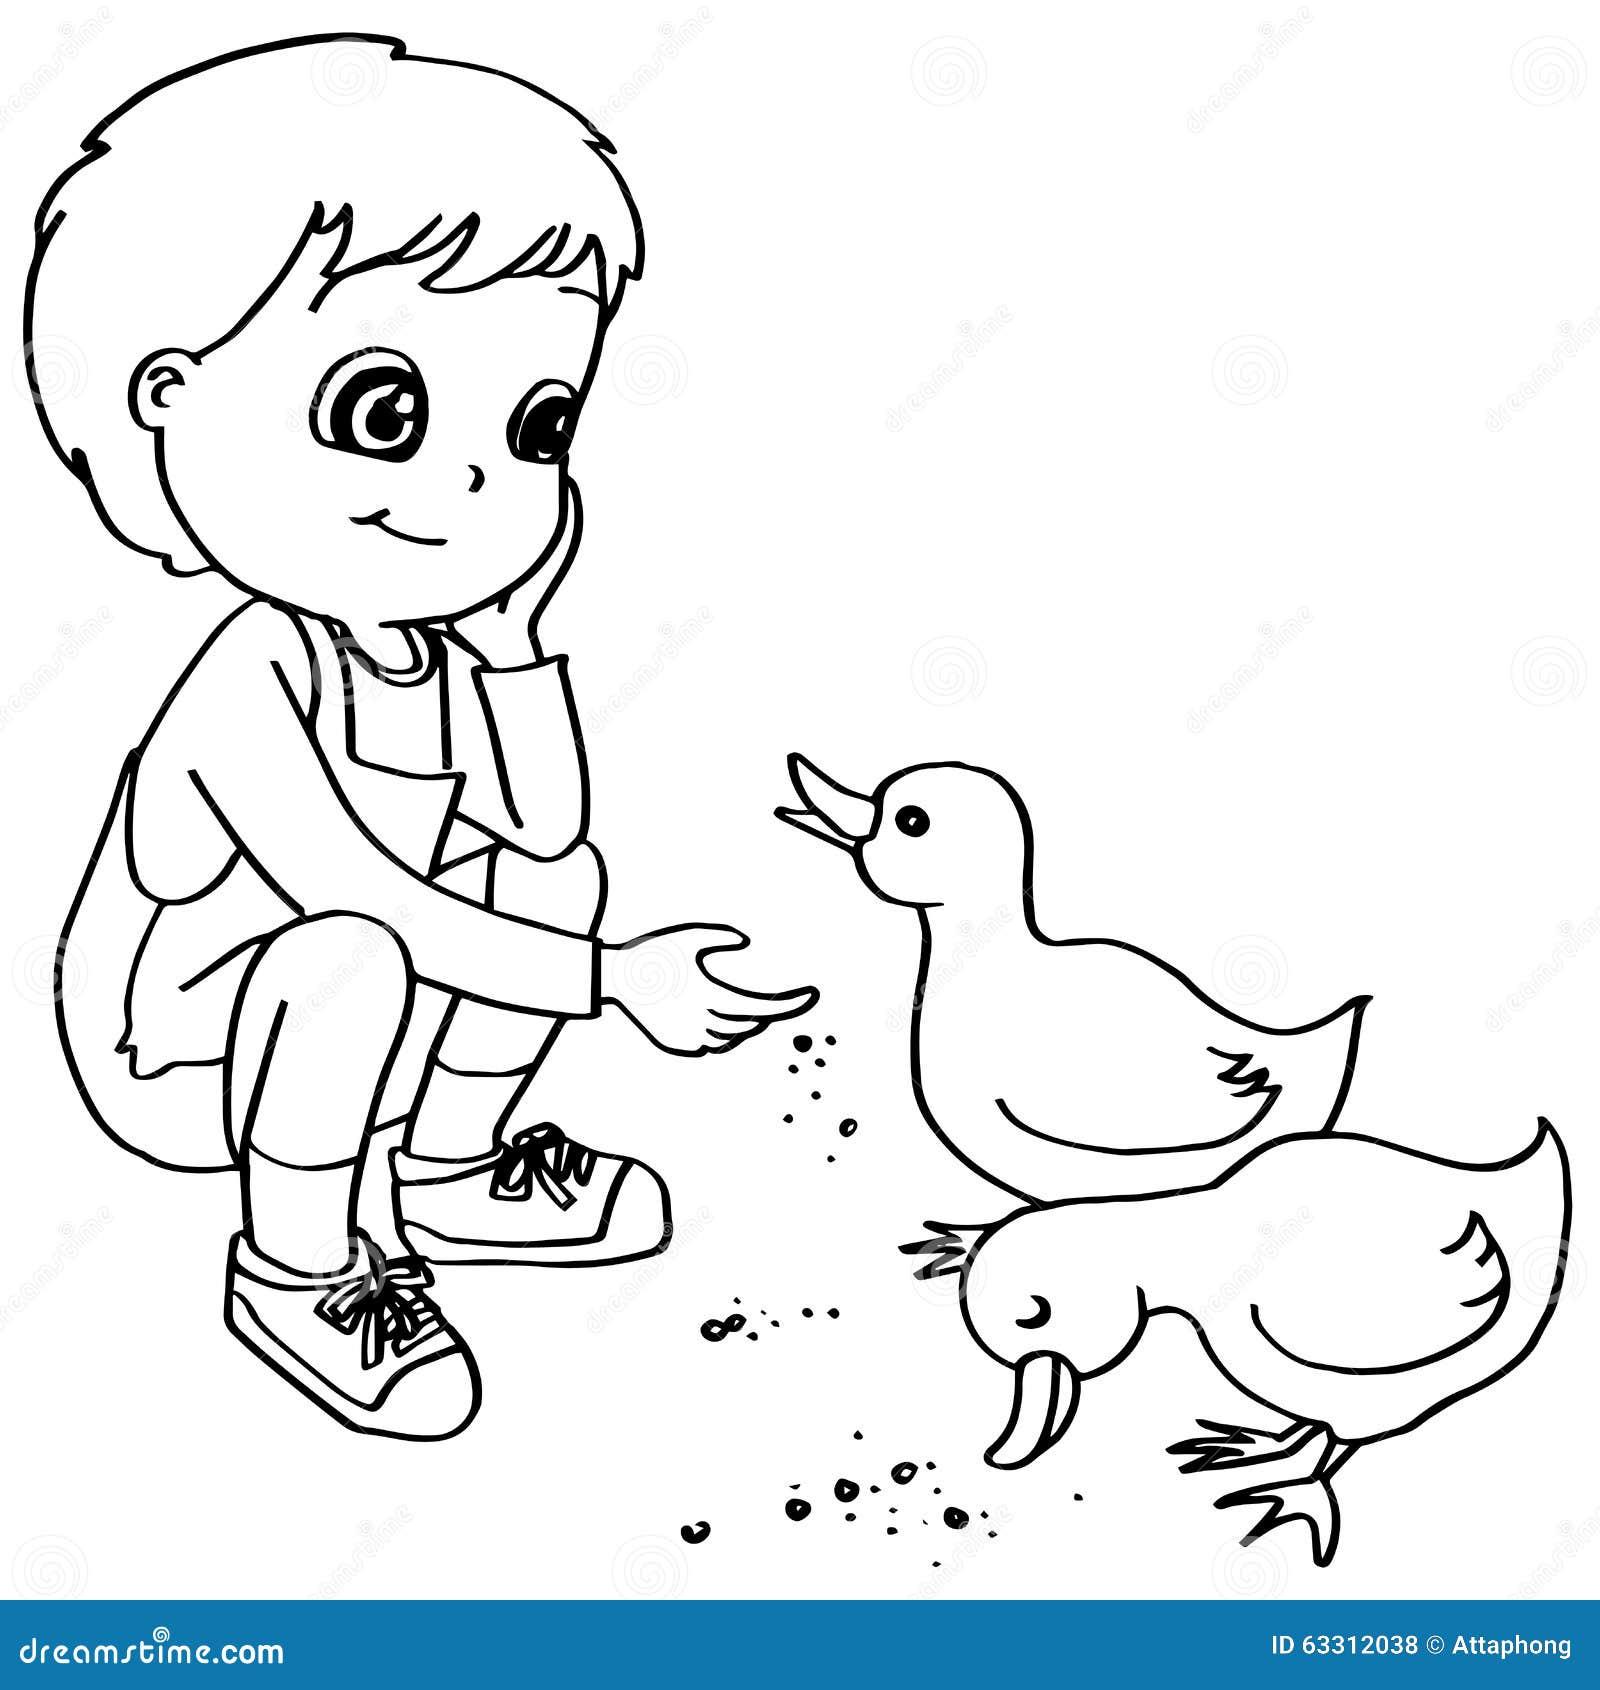 Coloring Book Child Feeding Ducks Vector Stock Vector - Illustration ...